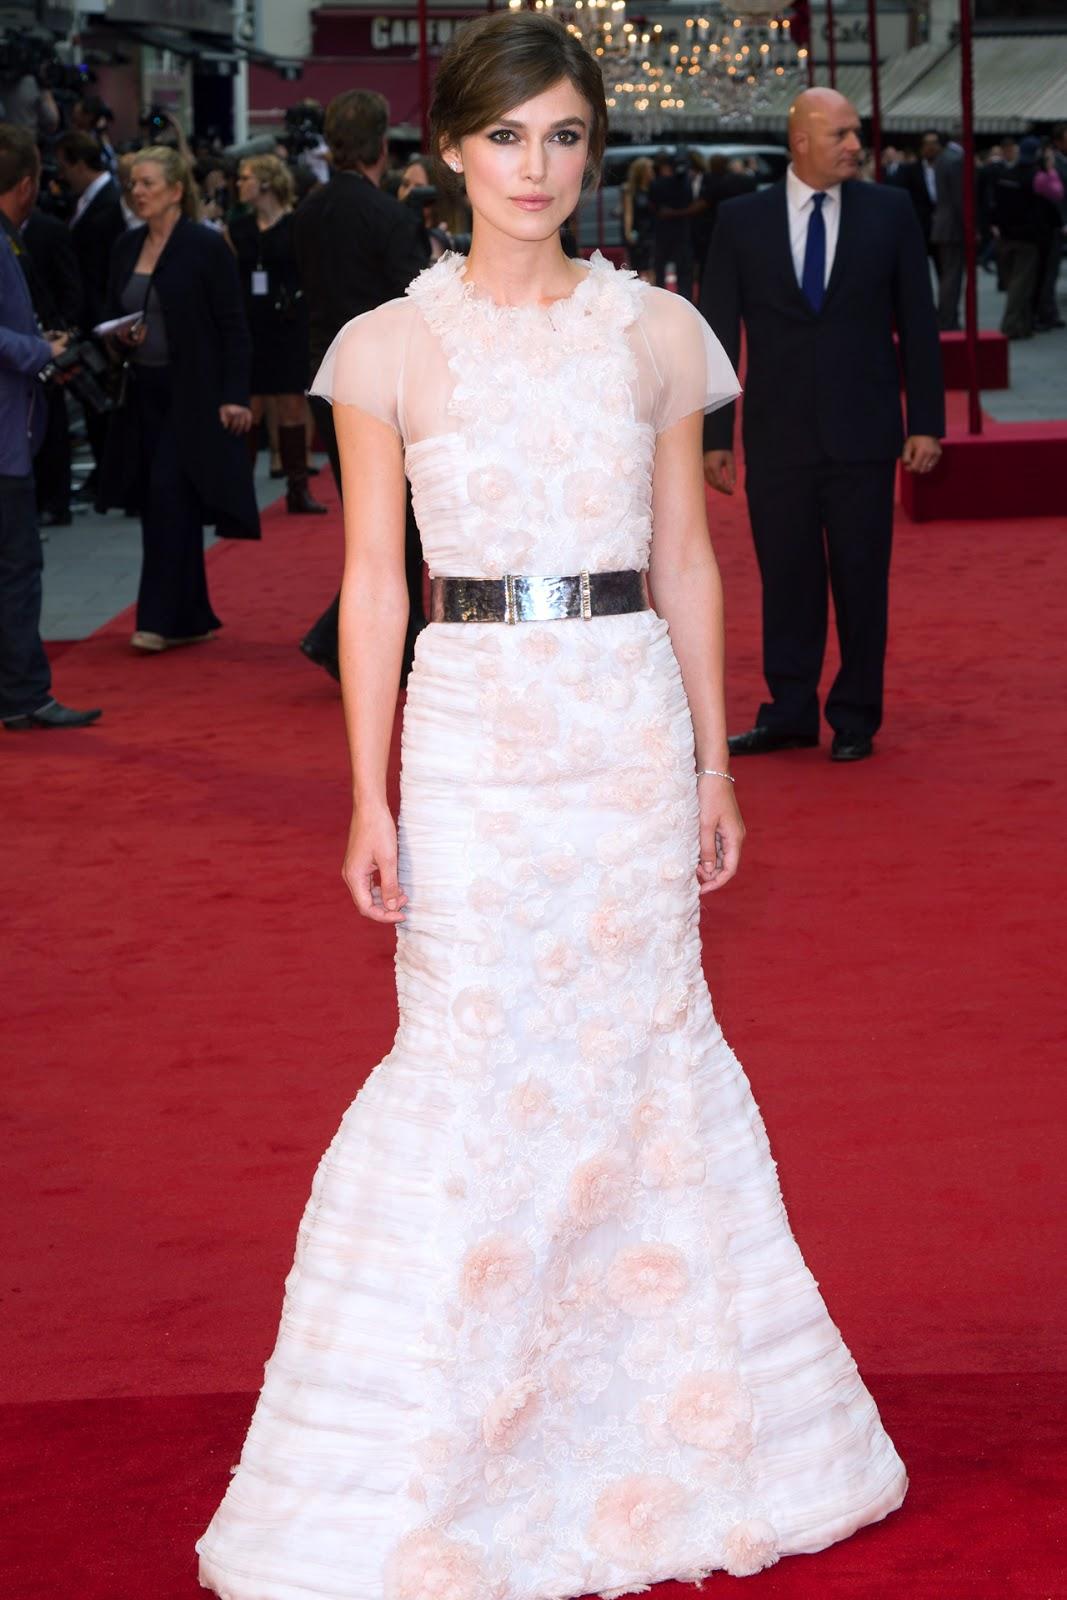 Keira Knightley Anna Karenina premiere in Chanel